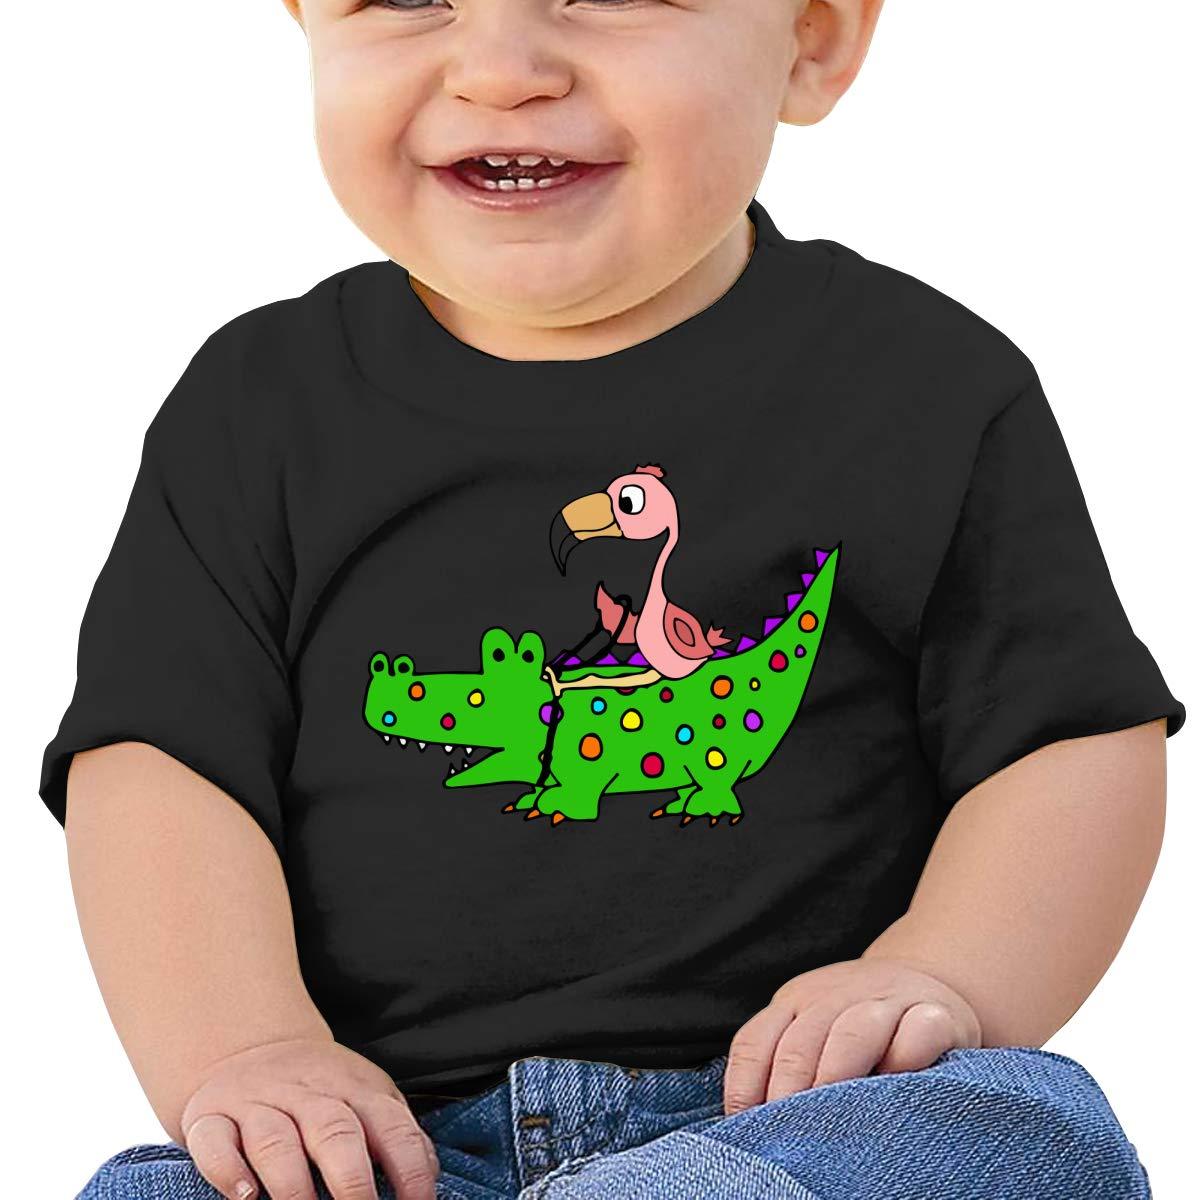 ZUGFGF-S3 Pink Flamingo Riding Alligator Baby Girls Newborn Short Sleeve T-Shirt 6-24 Month Cotton Tops